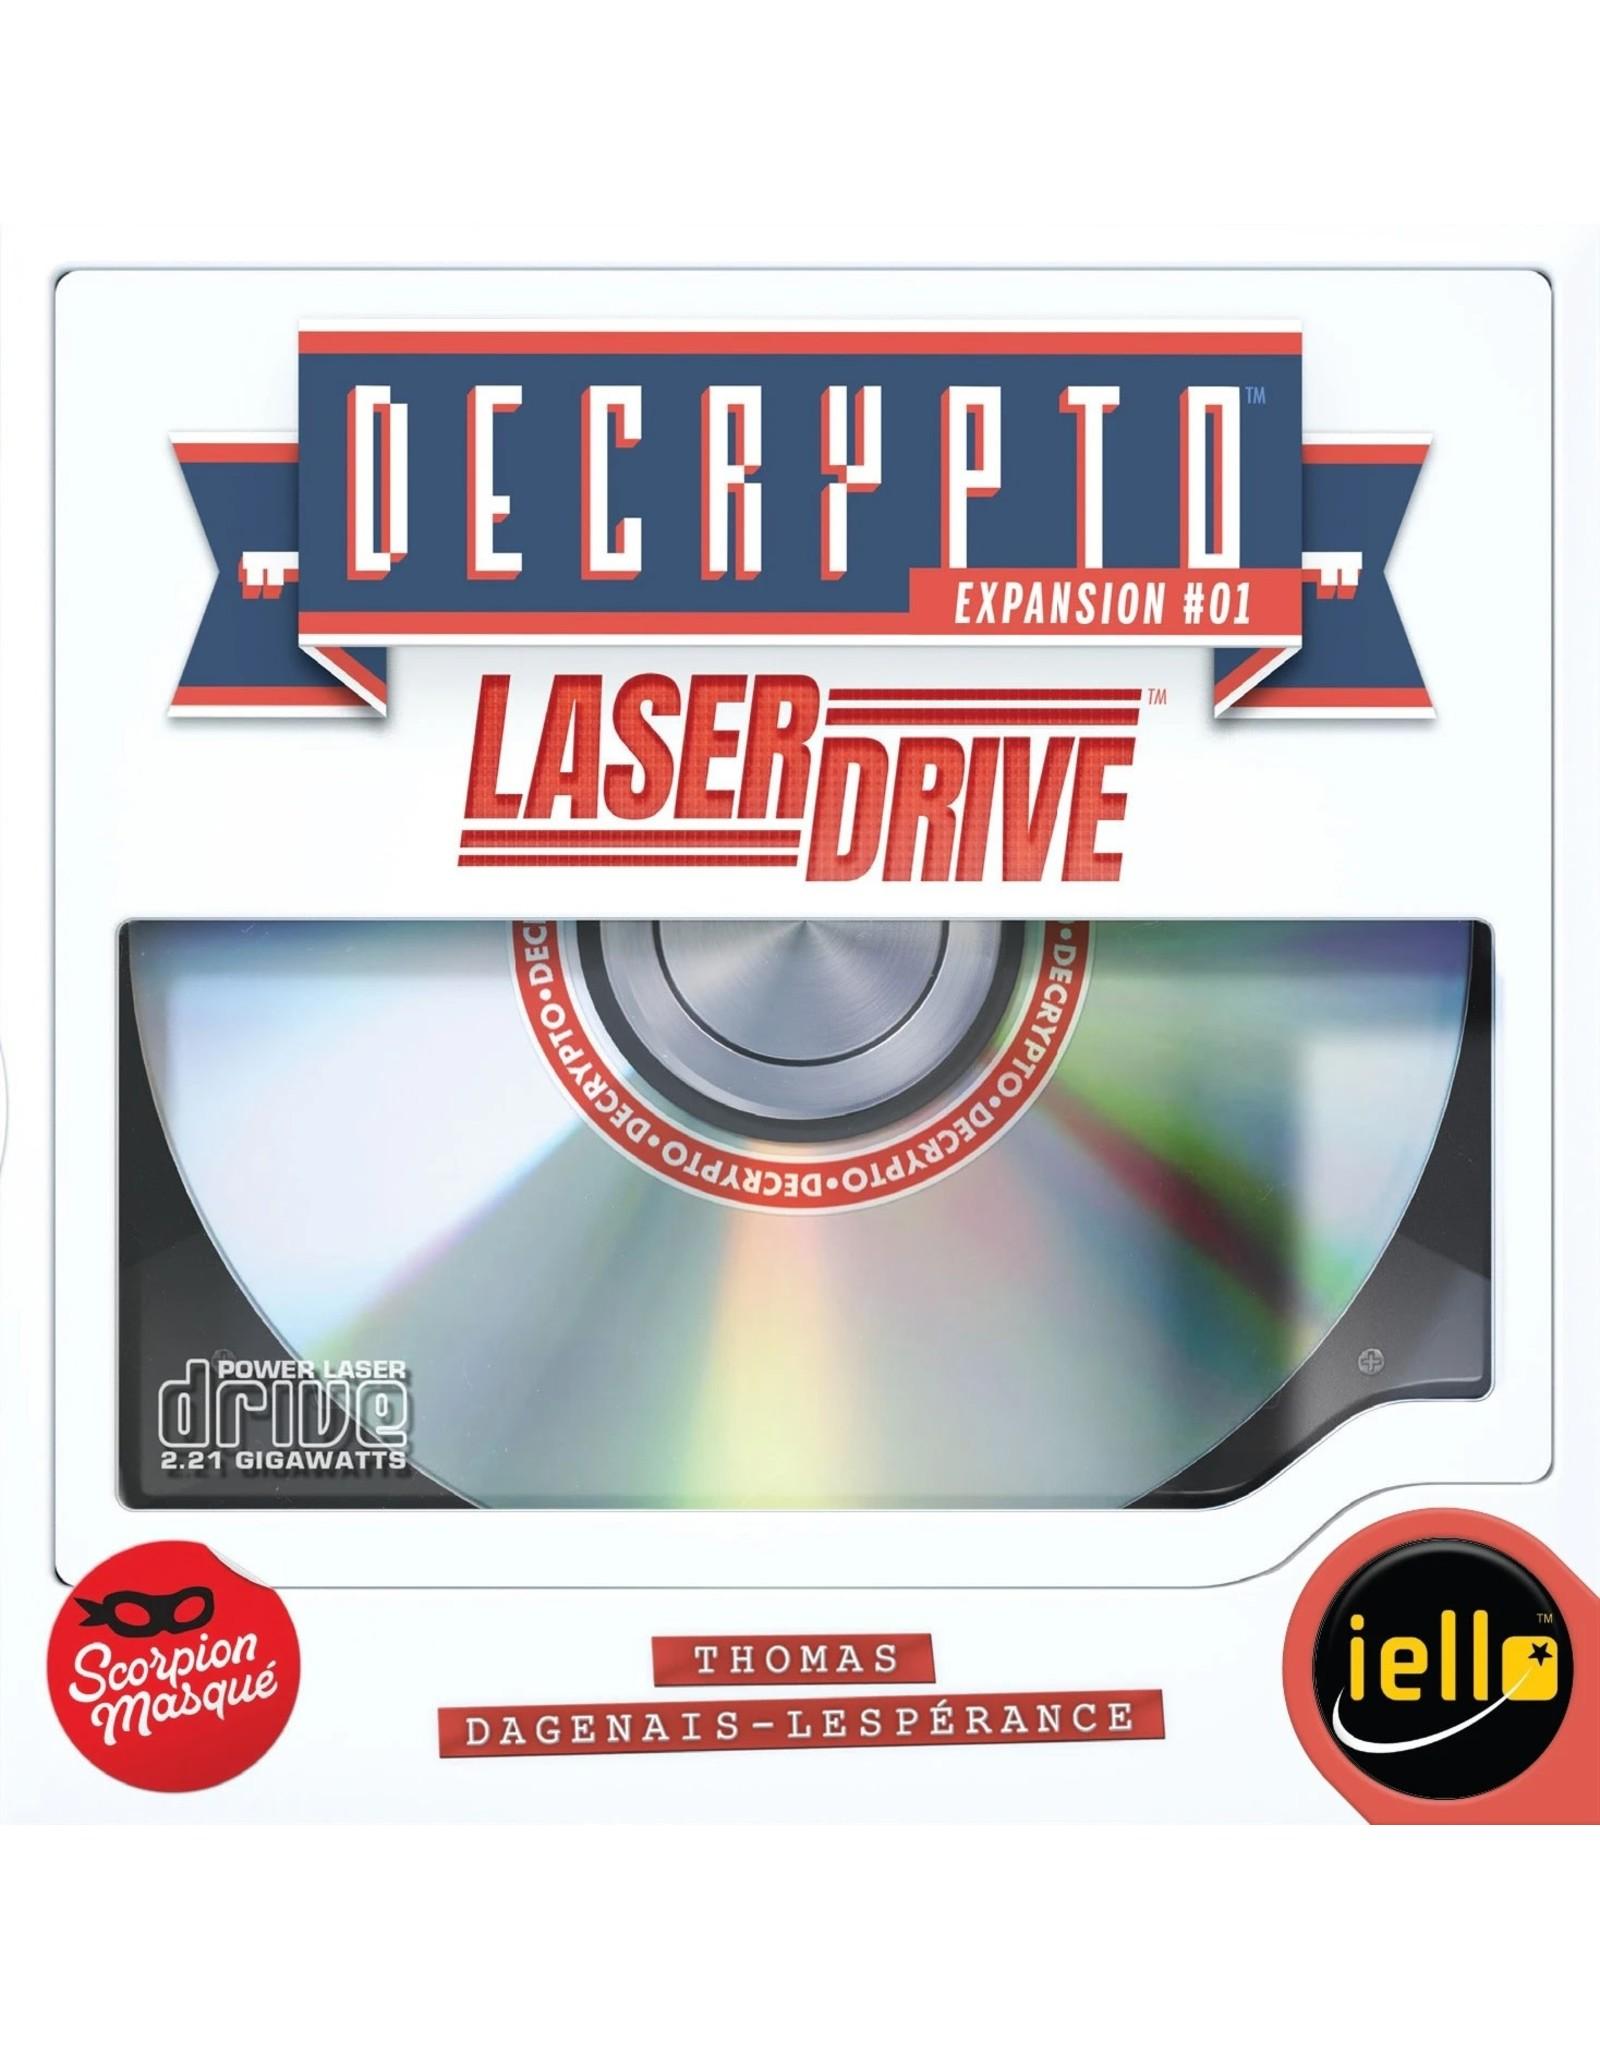 Scorpion Masque Decrypto Laser Drive